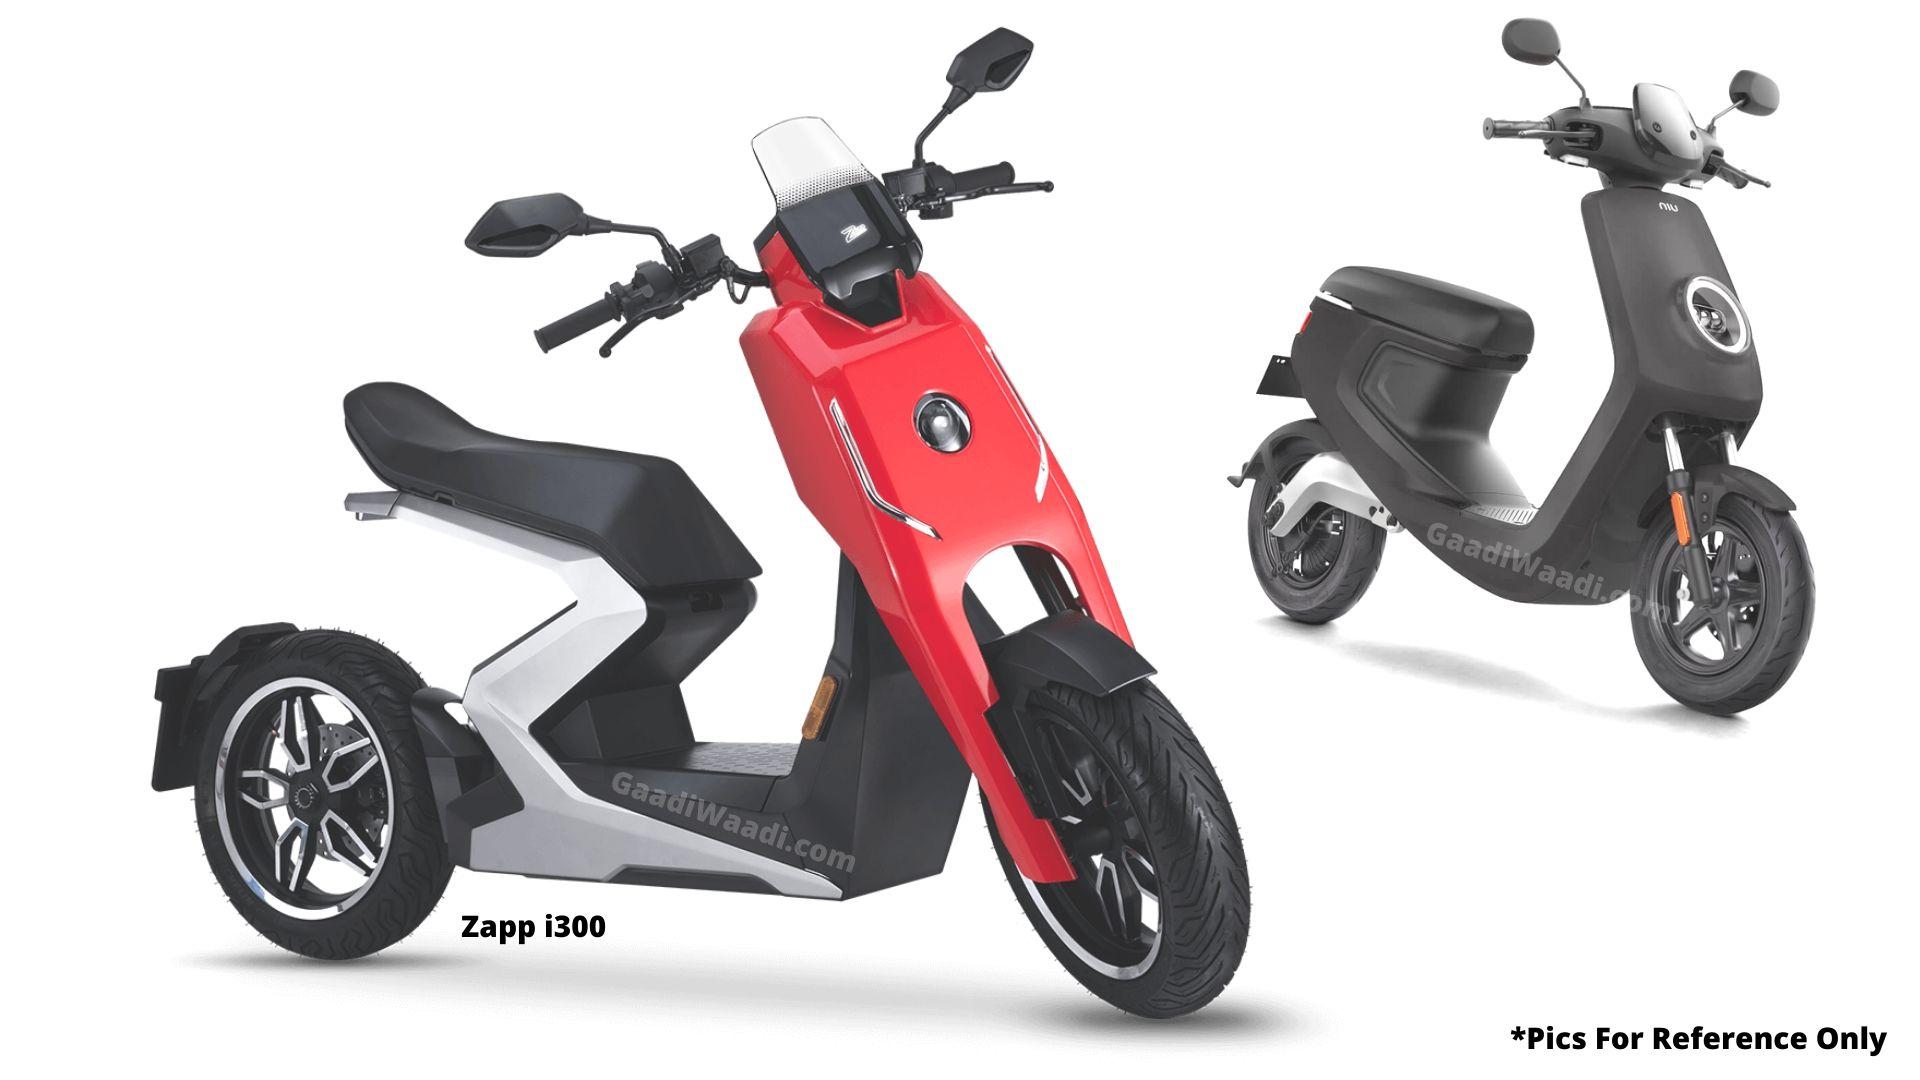 Bajaj To Supply Electric Scooter Under Rs. 35,000 In India - Report - GaadiWaadi.com thumbnail